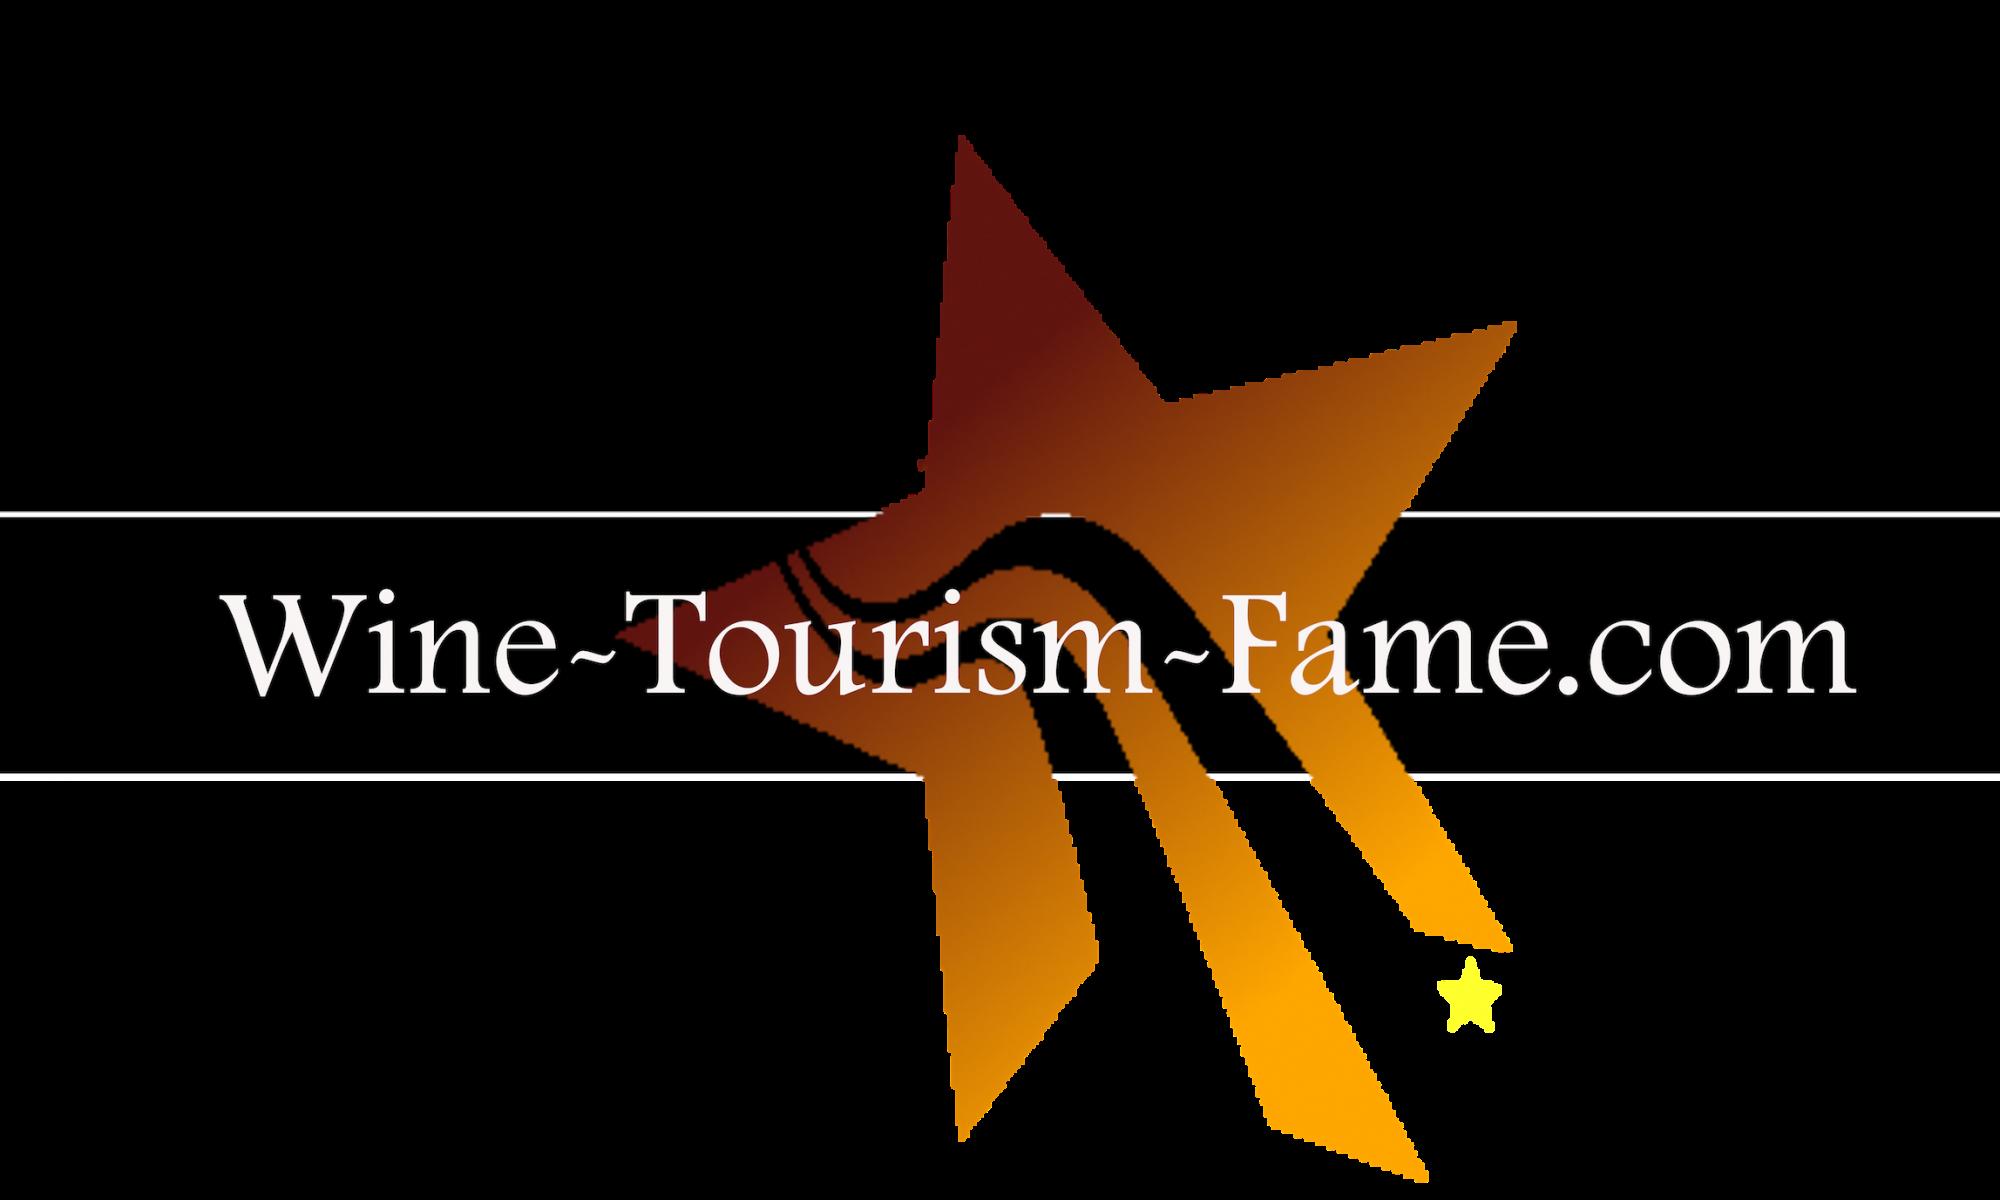 cropped-LOGO_FINAL_-WTF-BD-Neutre.png - Wine Tourism Fame